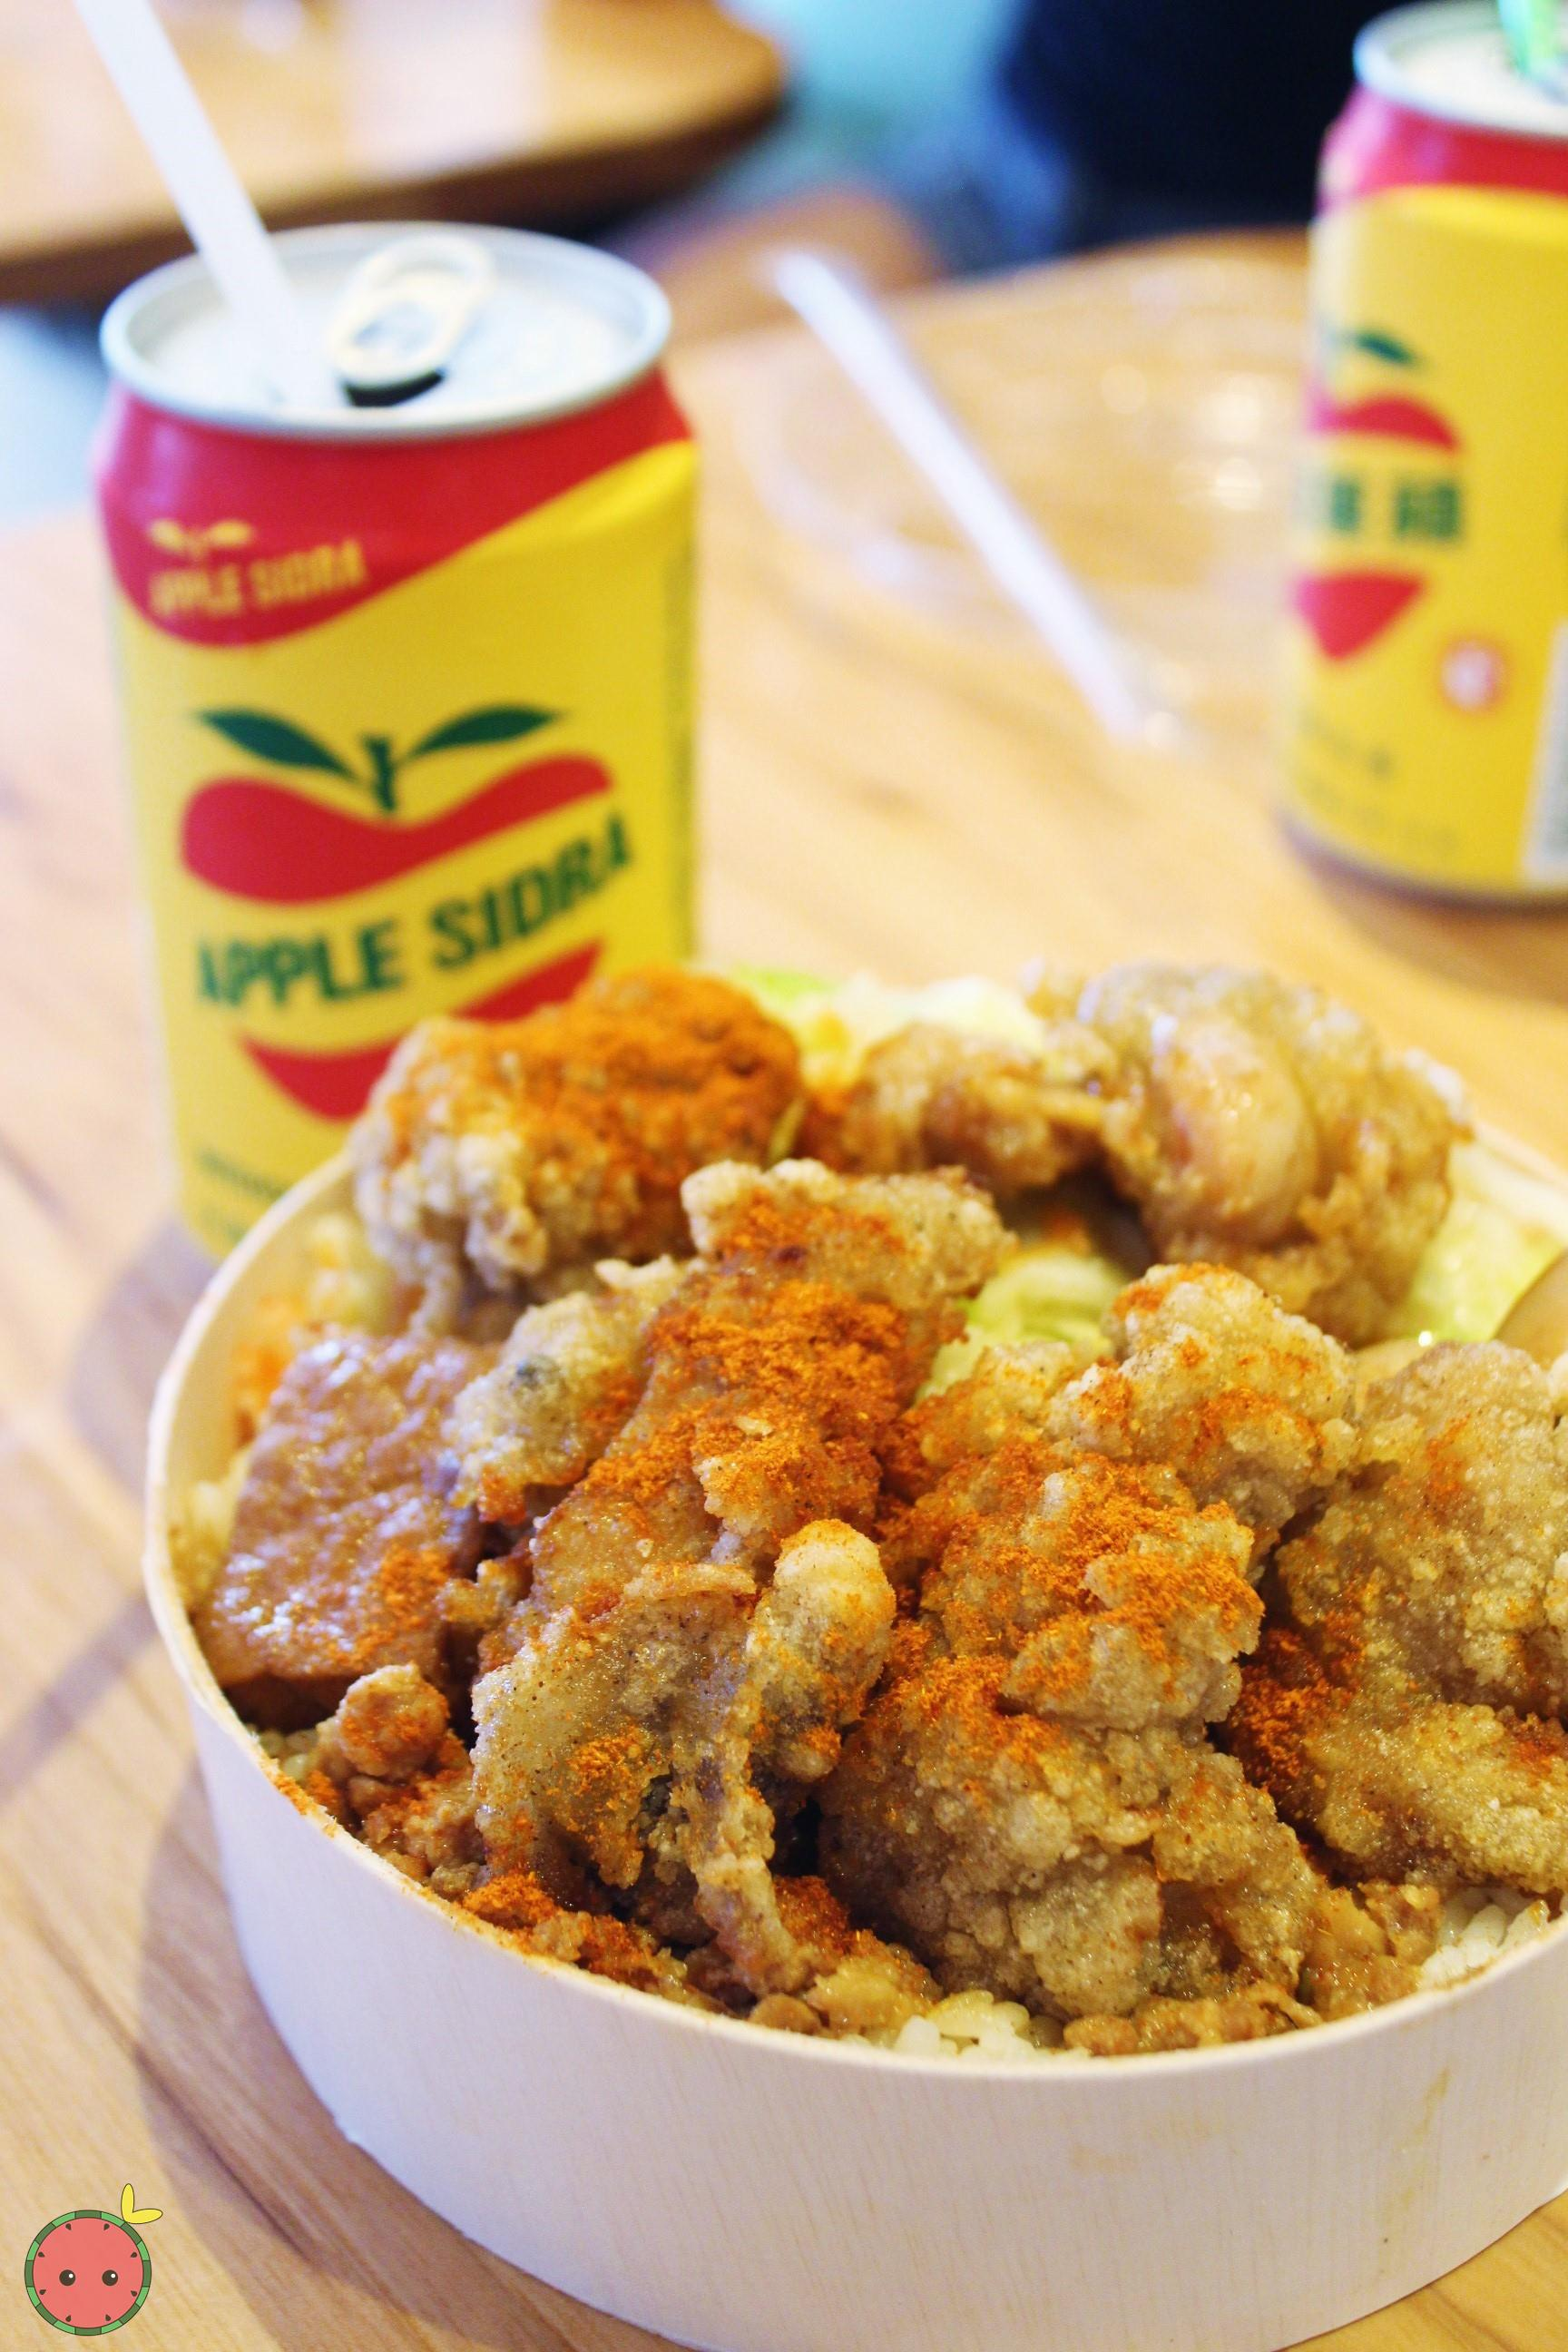 Night market crispy chicken bento box